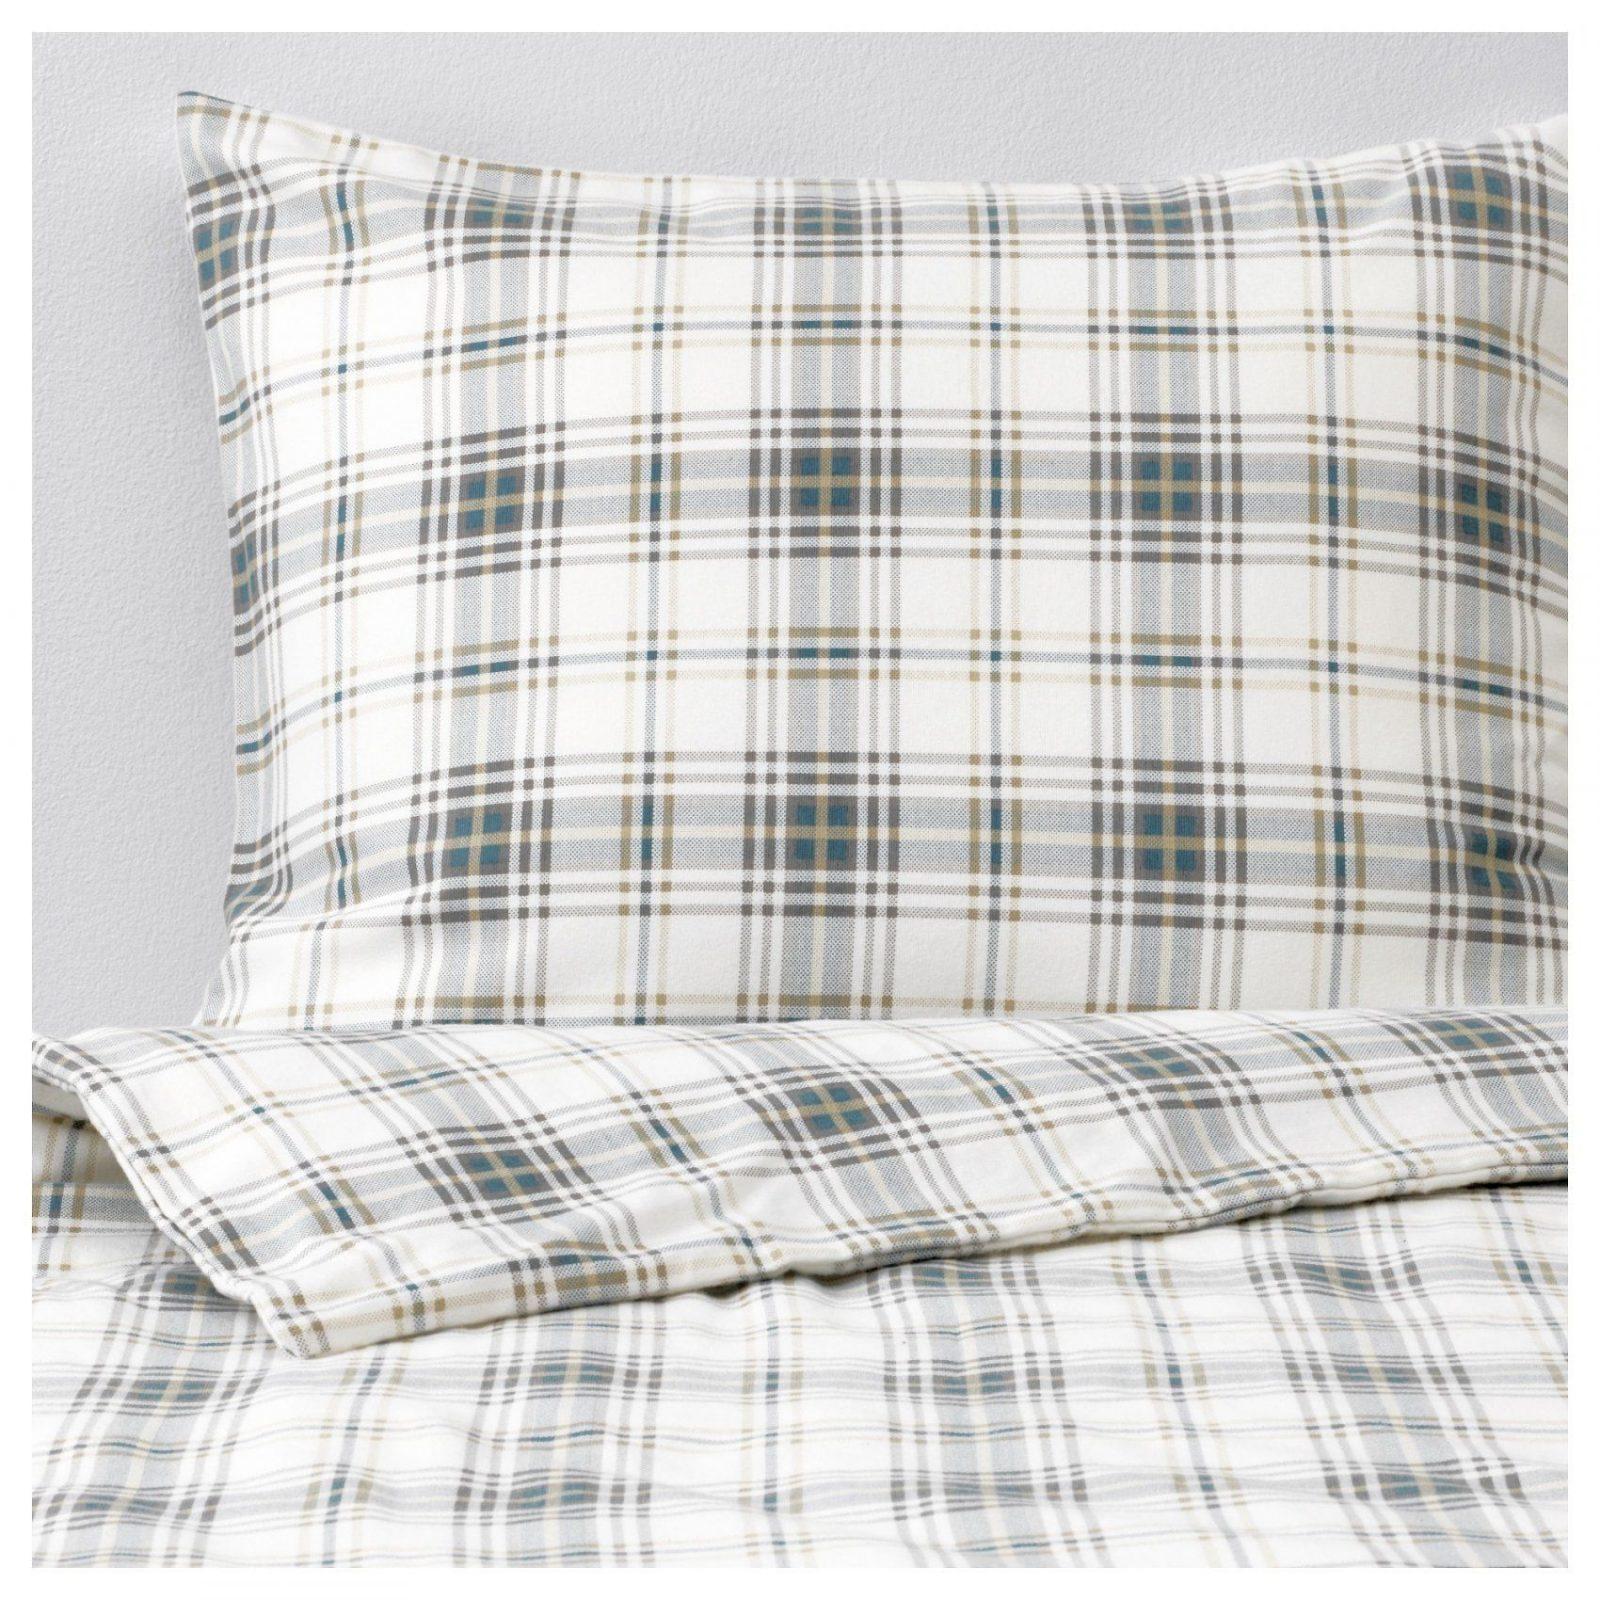 kreativ sch n flanell bettw sche ikea pe s5 haus zum. Black Bedroom Furniture Sets. Home Design Ideas